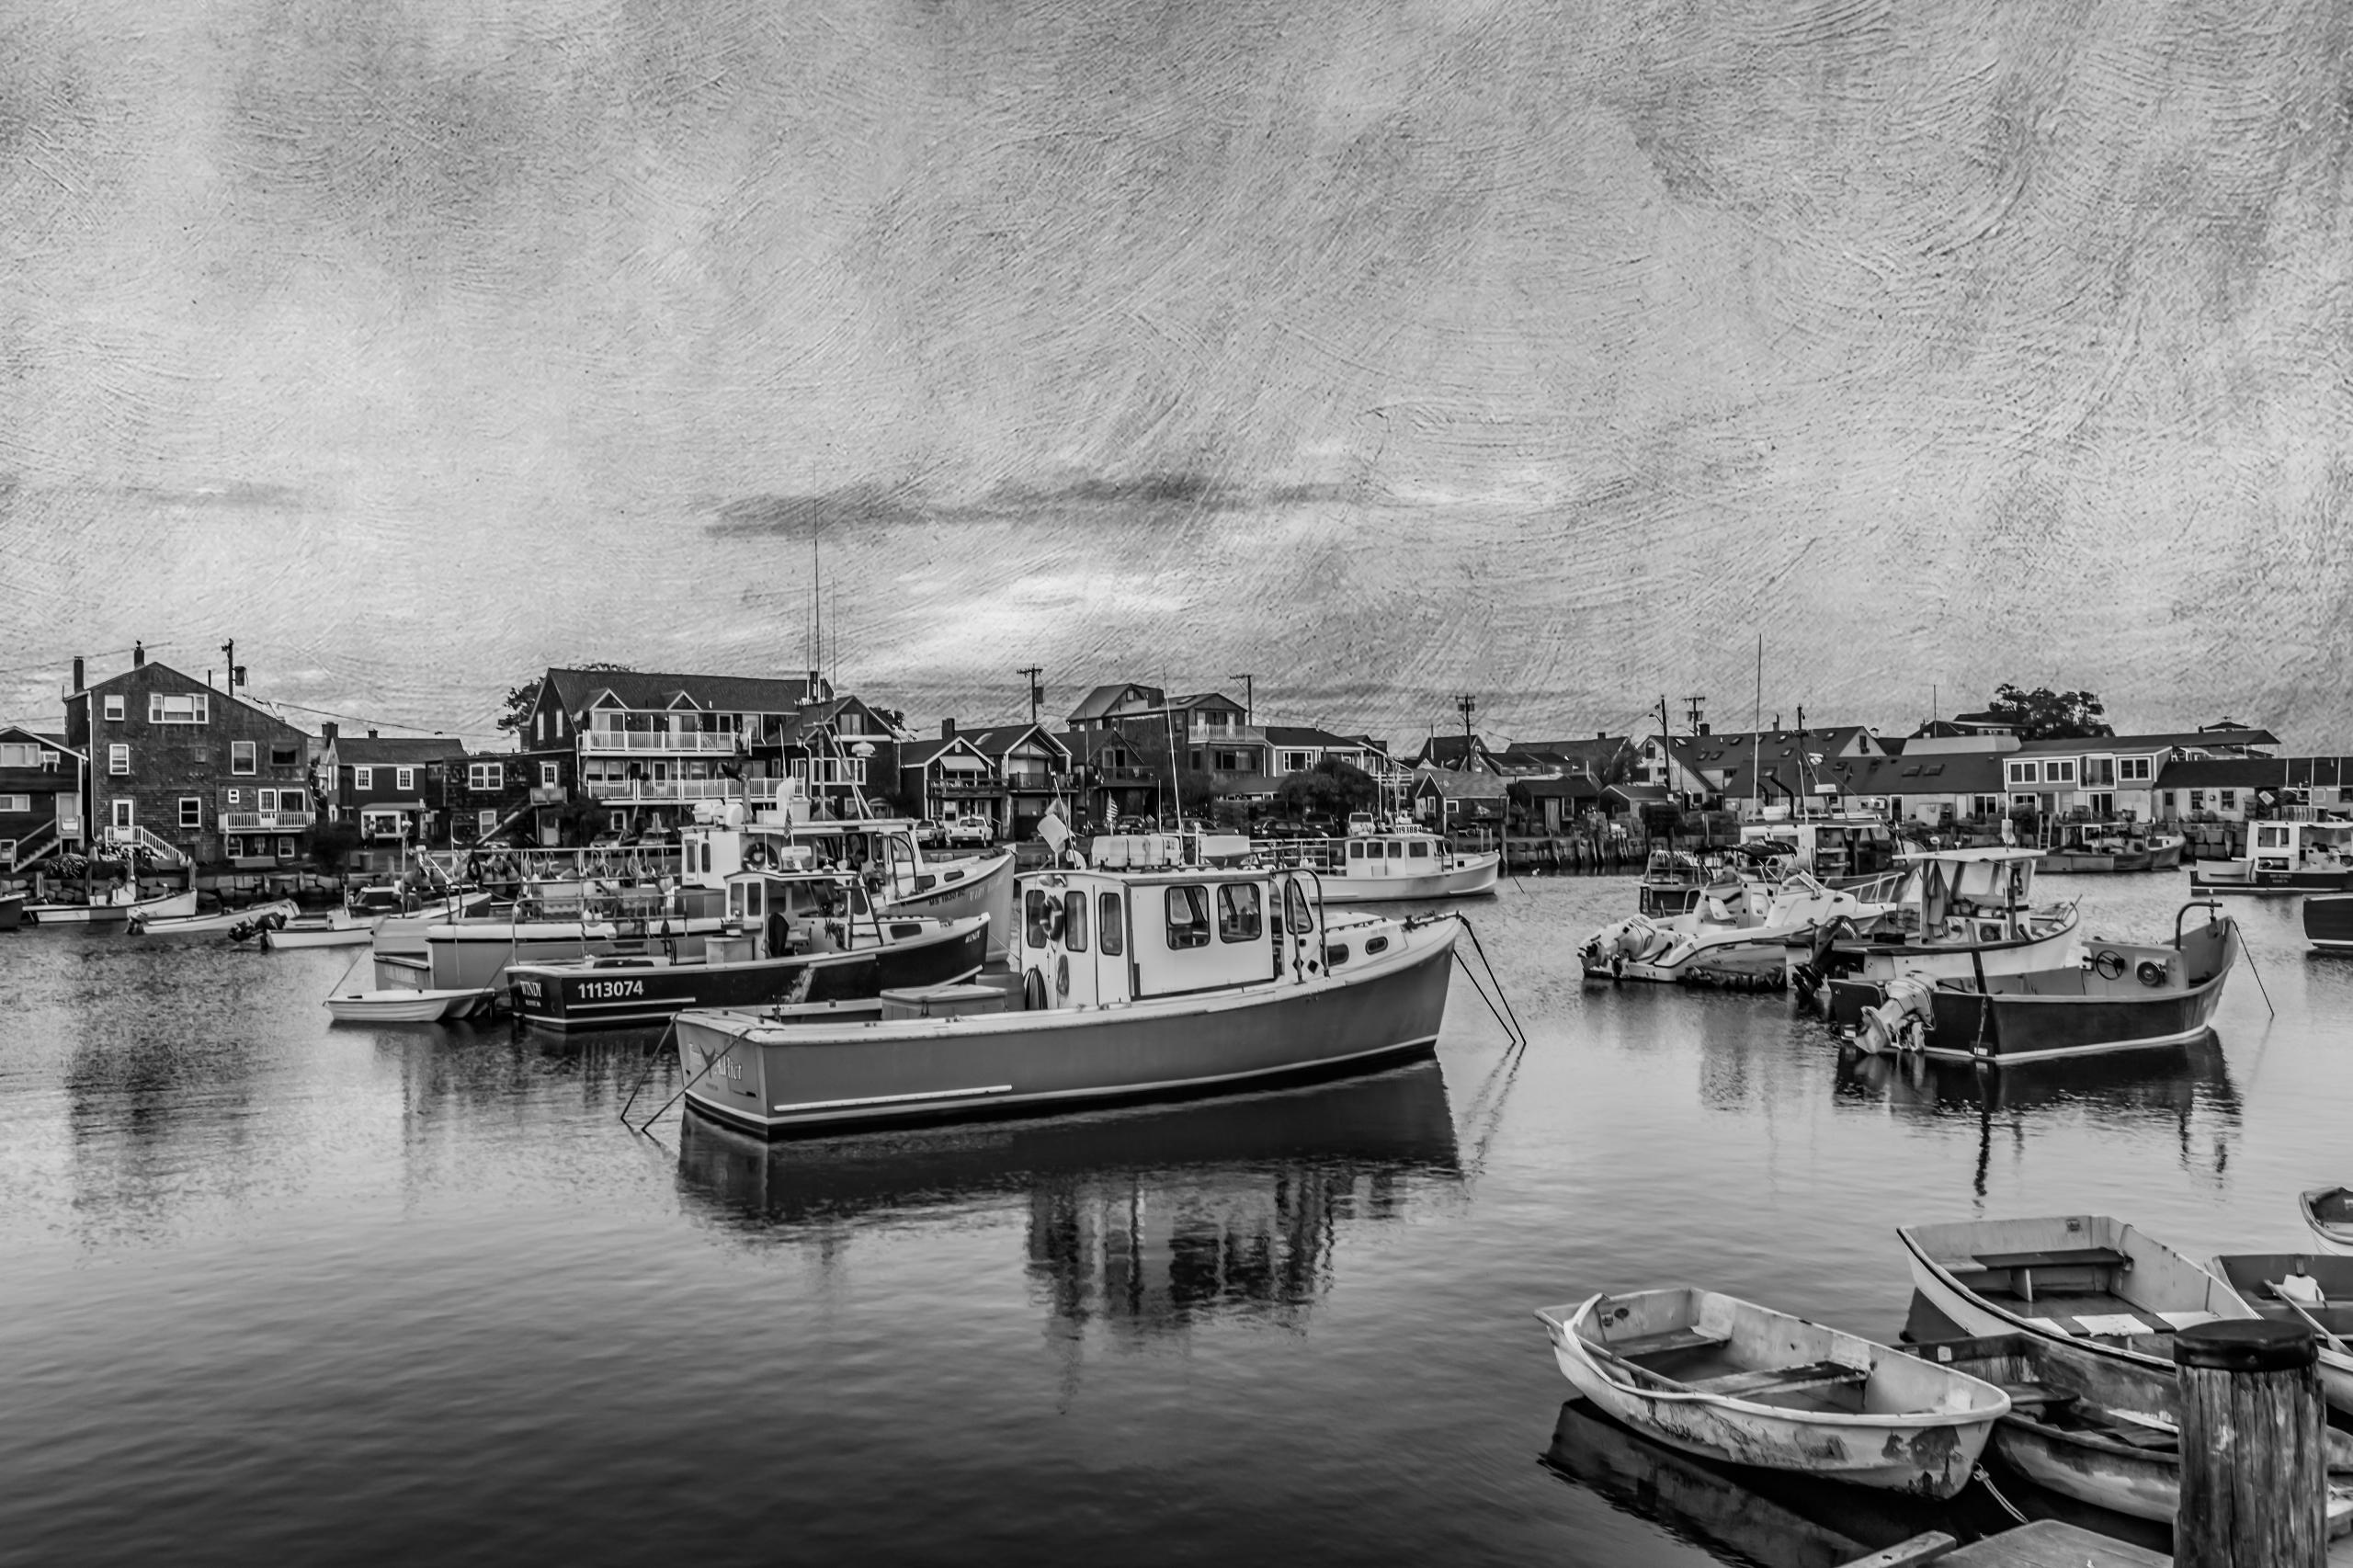 Addict boats marina disappear r - davidseibold | ello